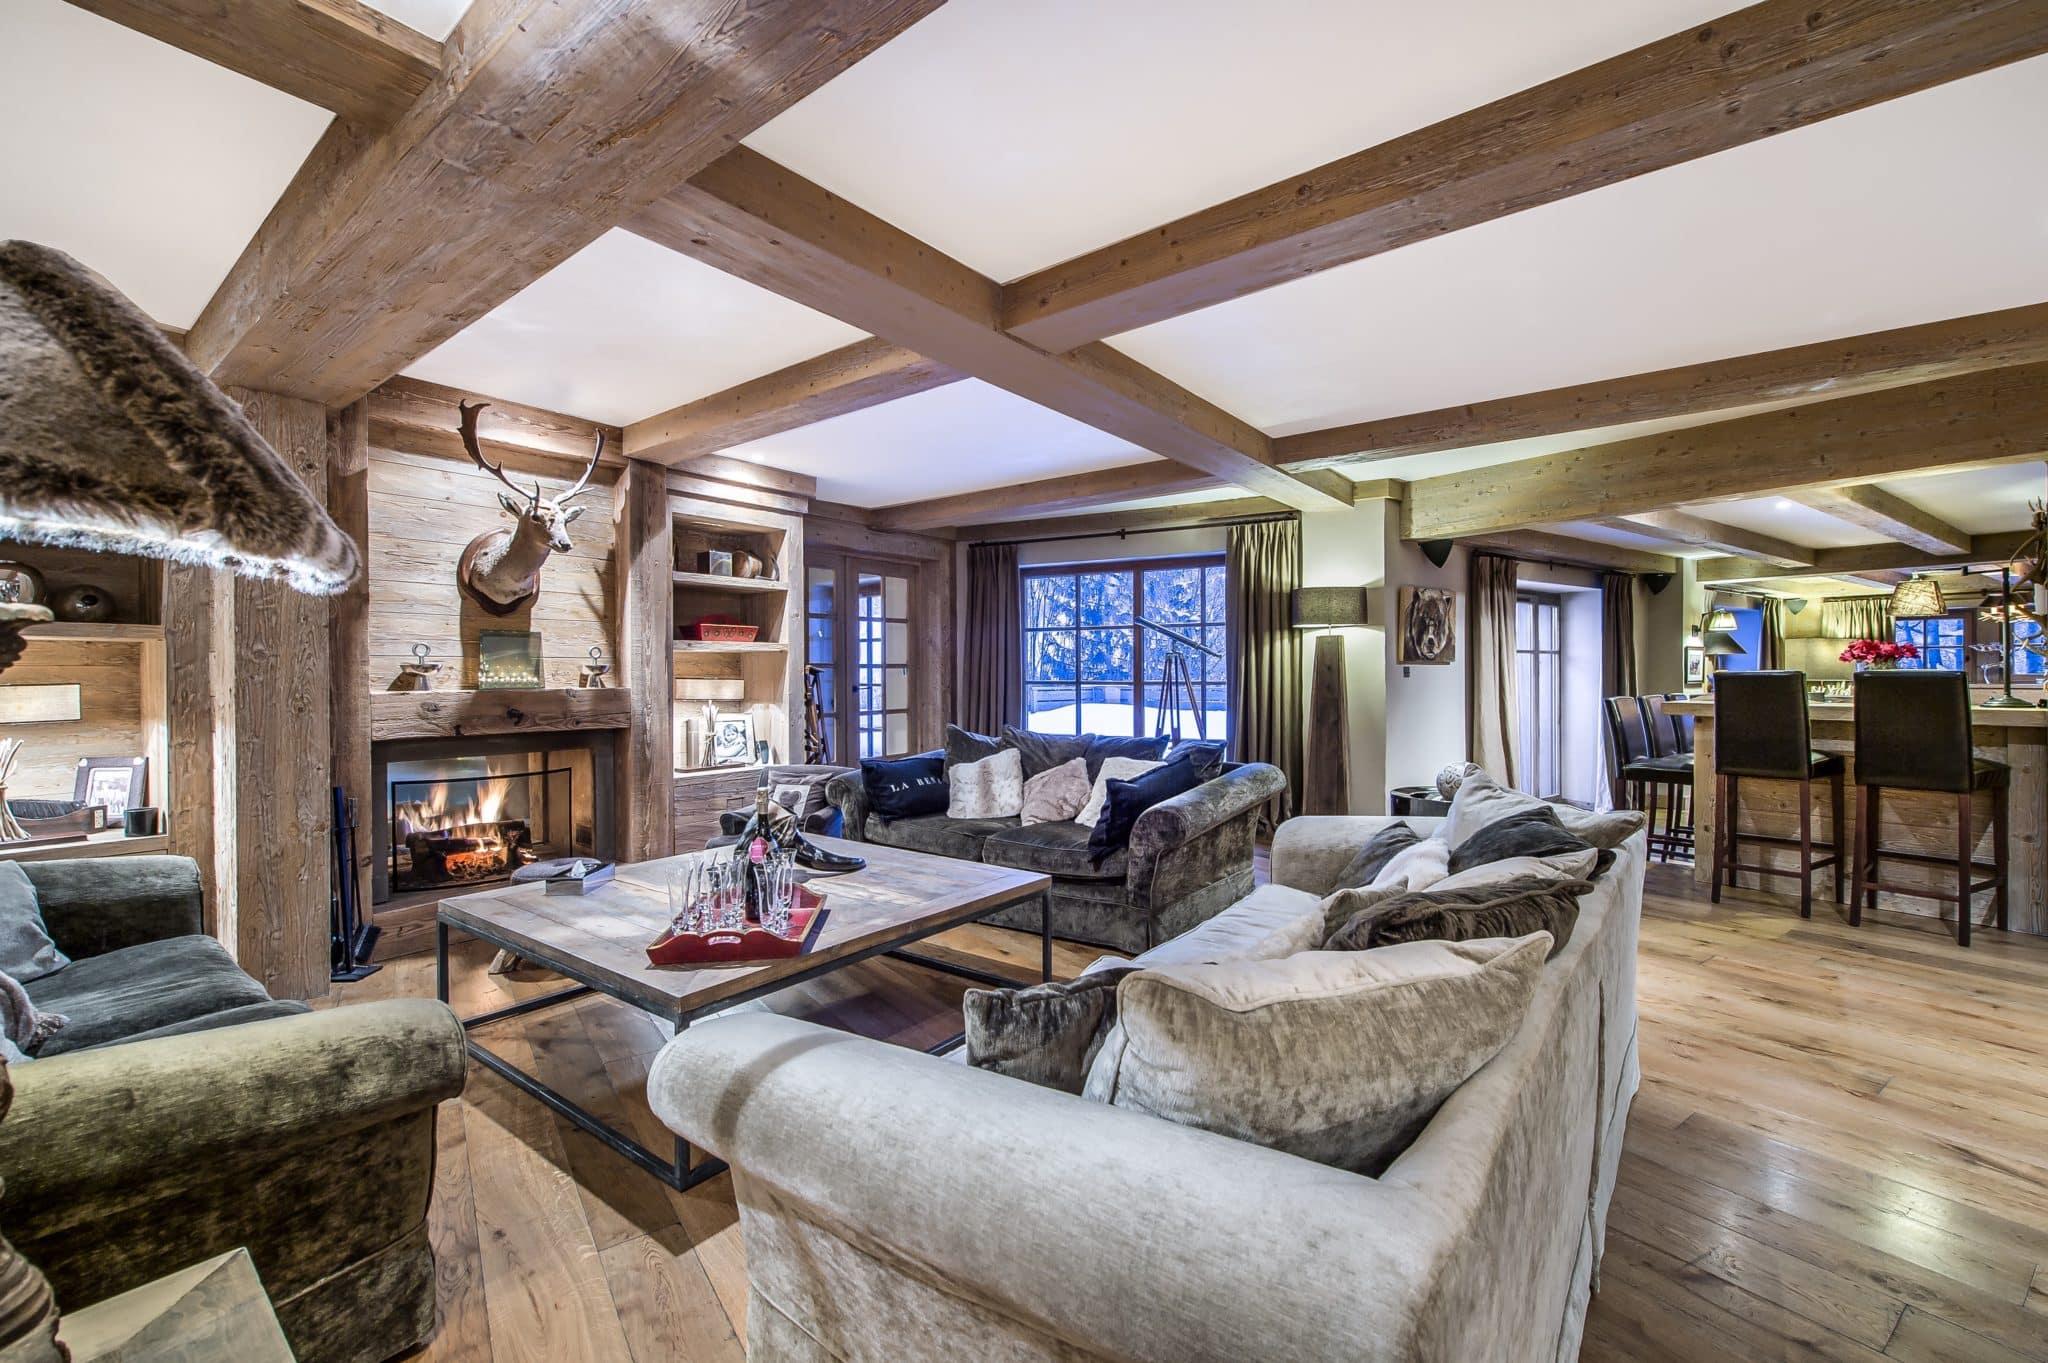 Salon 4 Chalet de Ski de Luxe Cristal Lodge Meribel